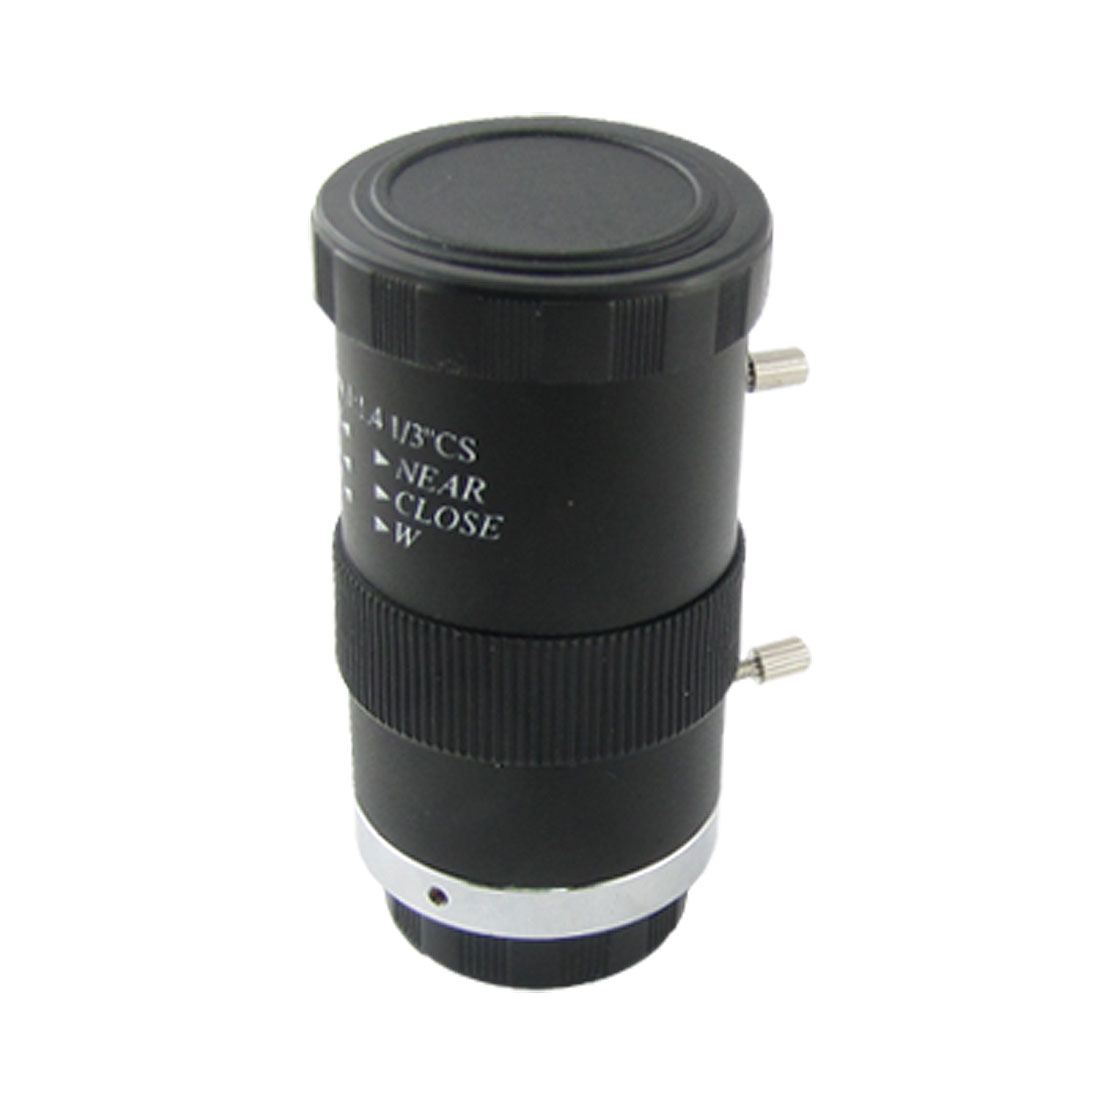 "6-15mm 1/3"" F1.4 CS Mount Varifocal CCTV Manual Lens"